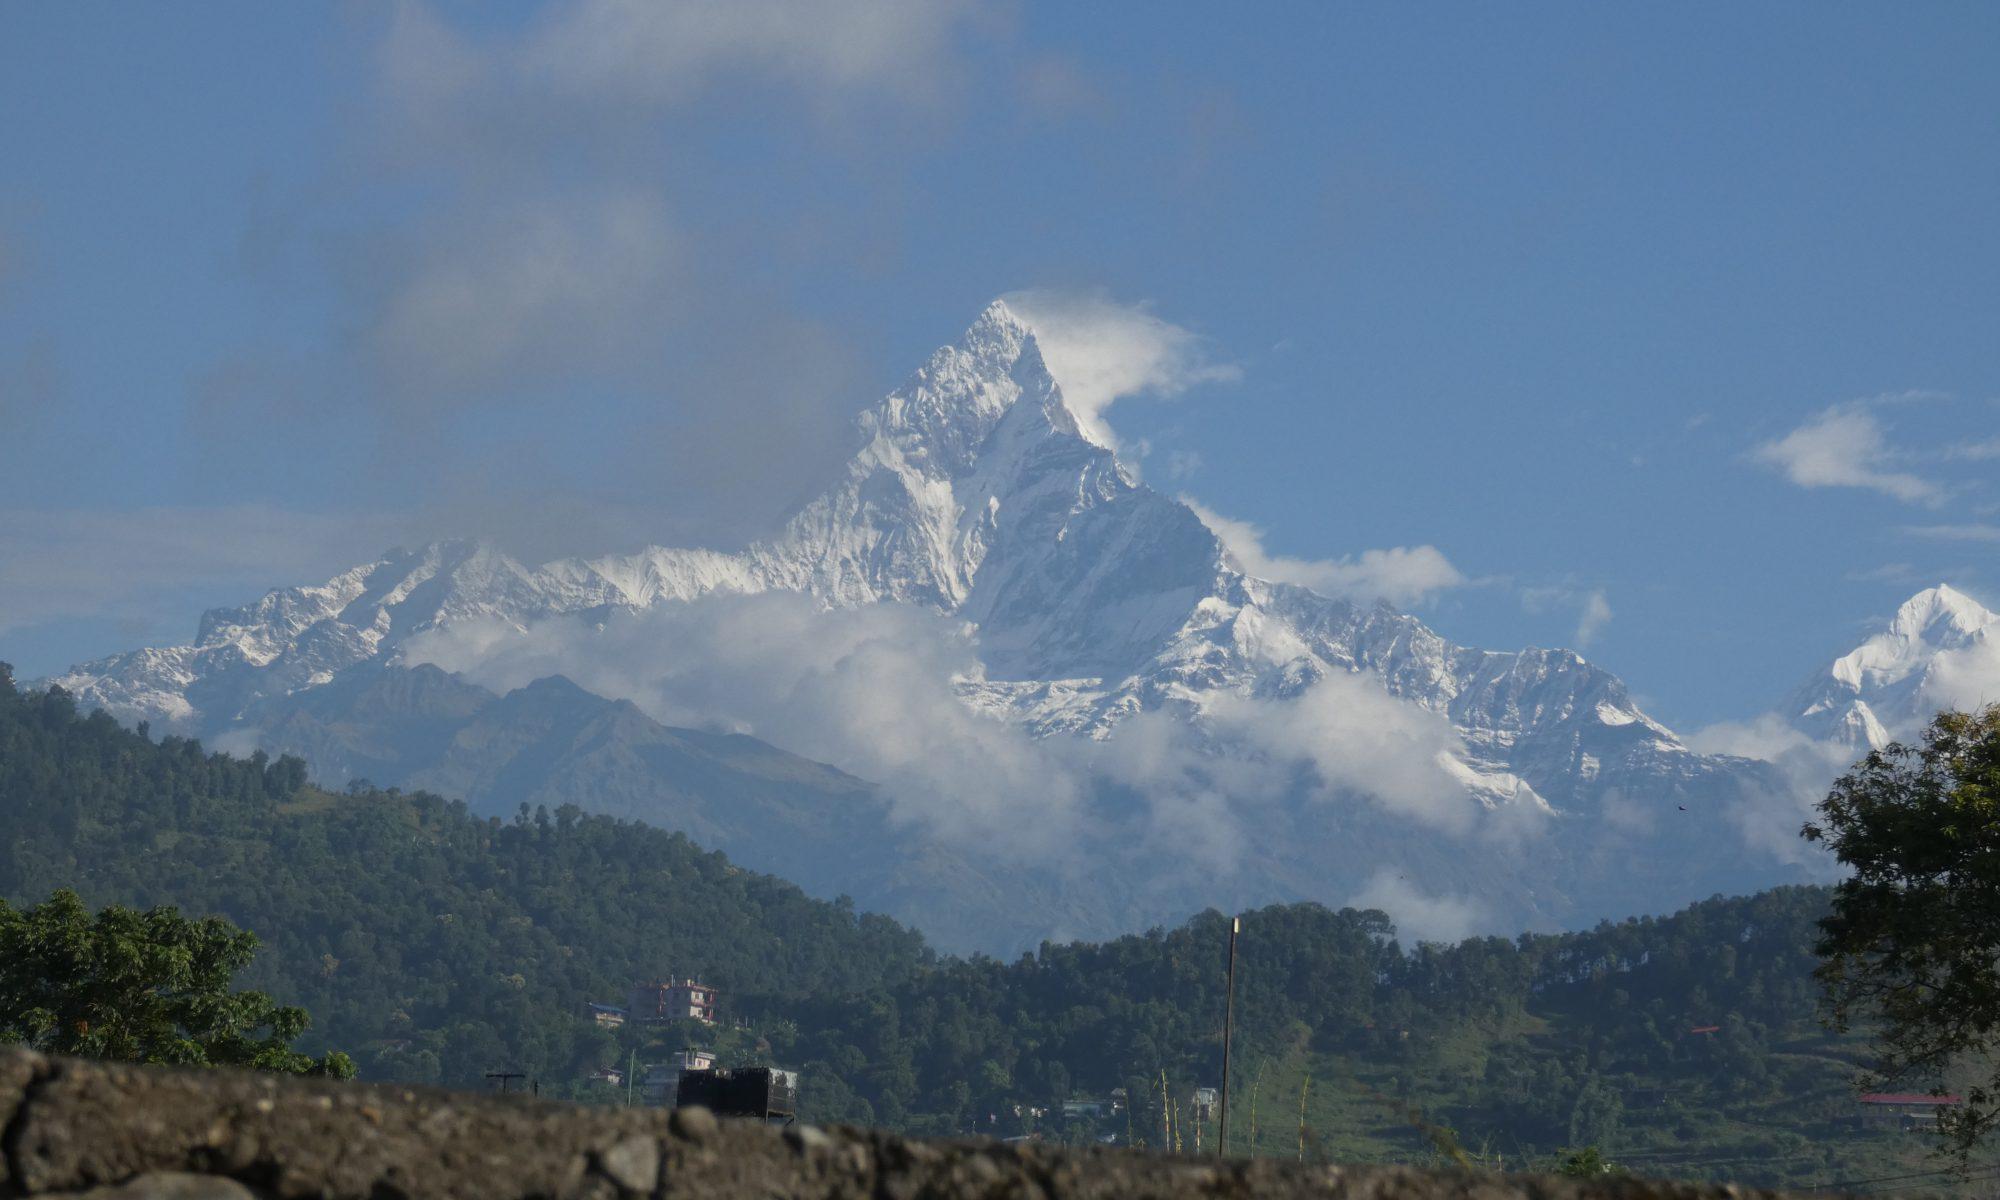 Nepal - abseits unserer Normalität